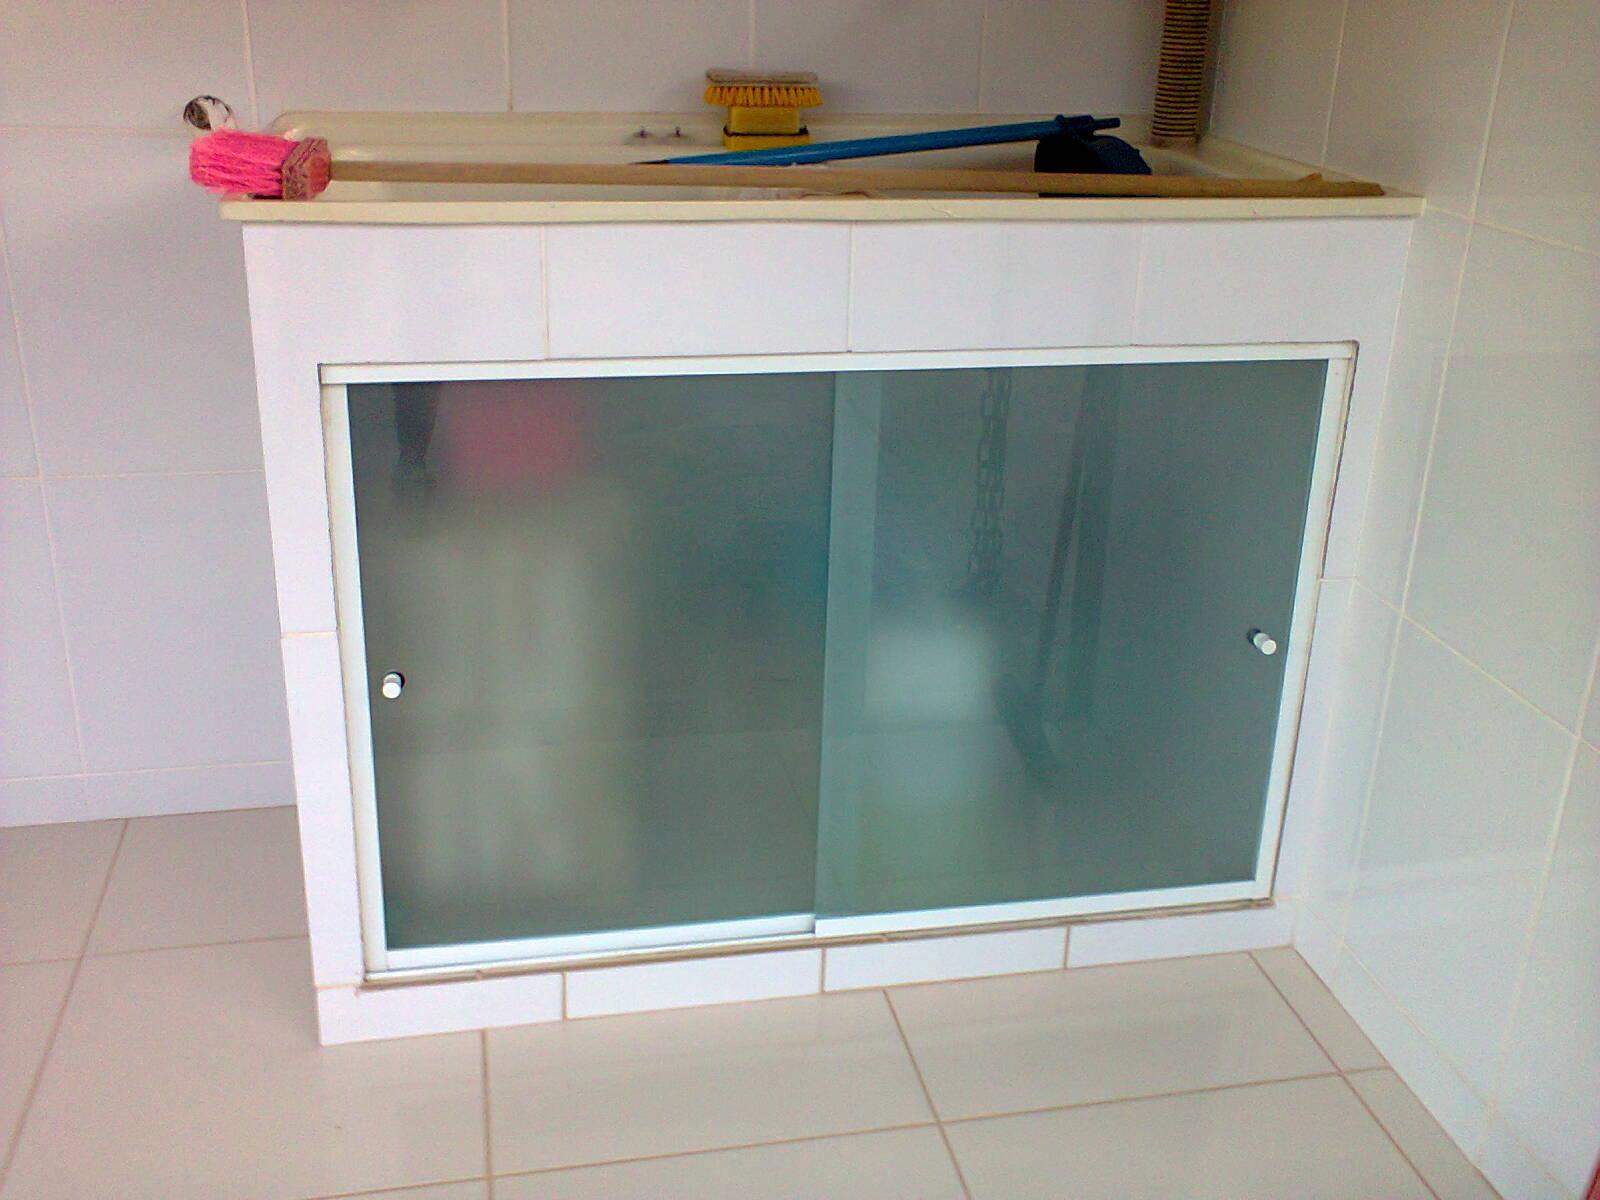 armario de pia cozinha vidro armario de pia cozinha vidro 3 Car Tuning #6D4825 1600 1200